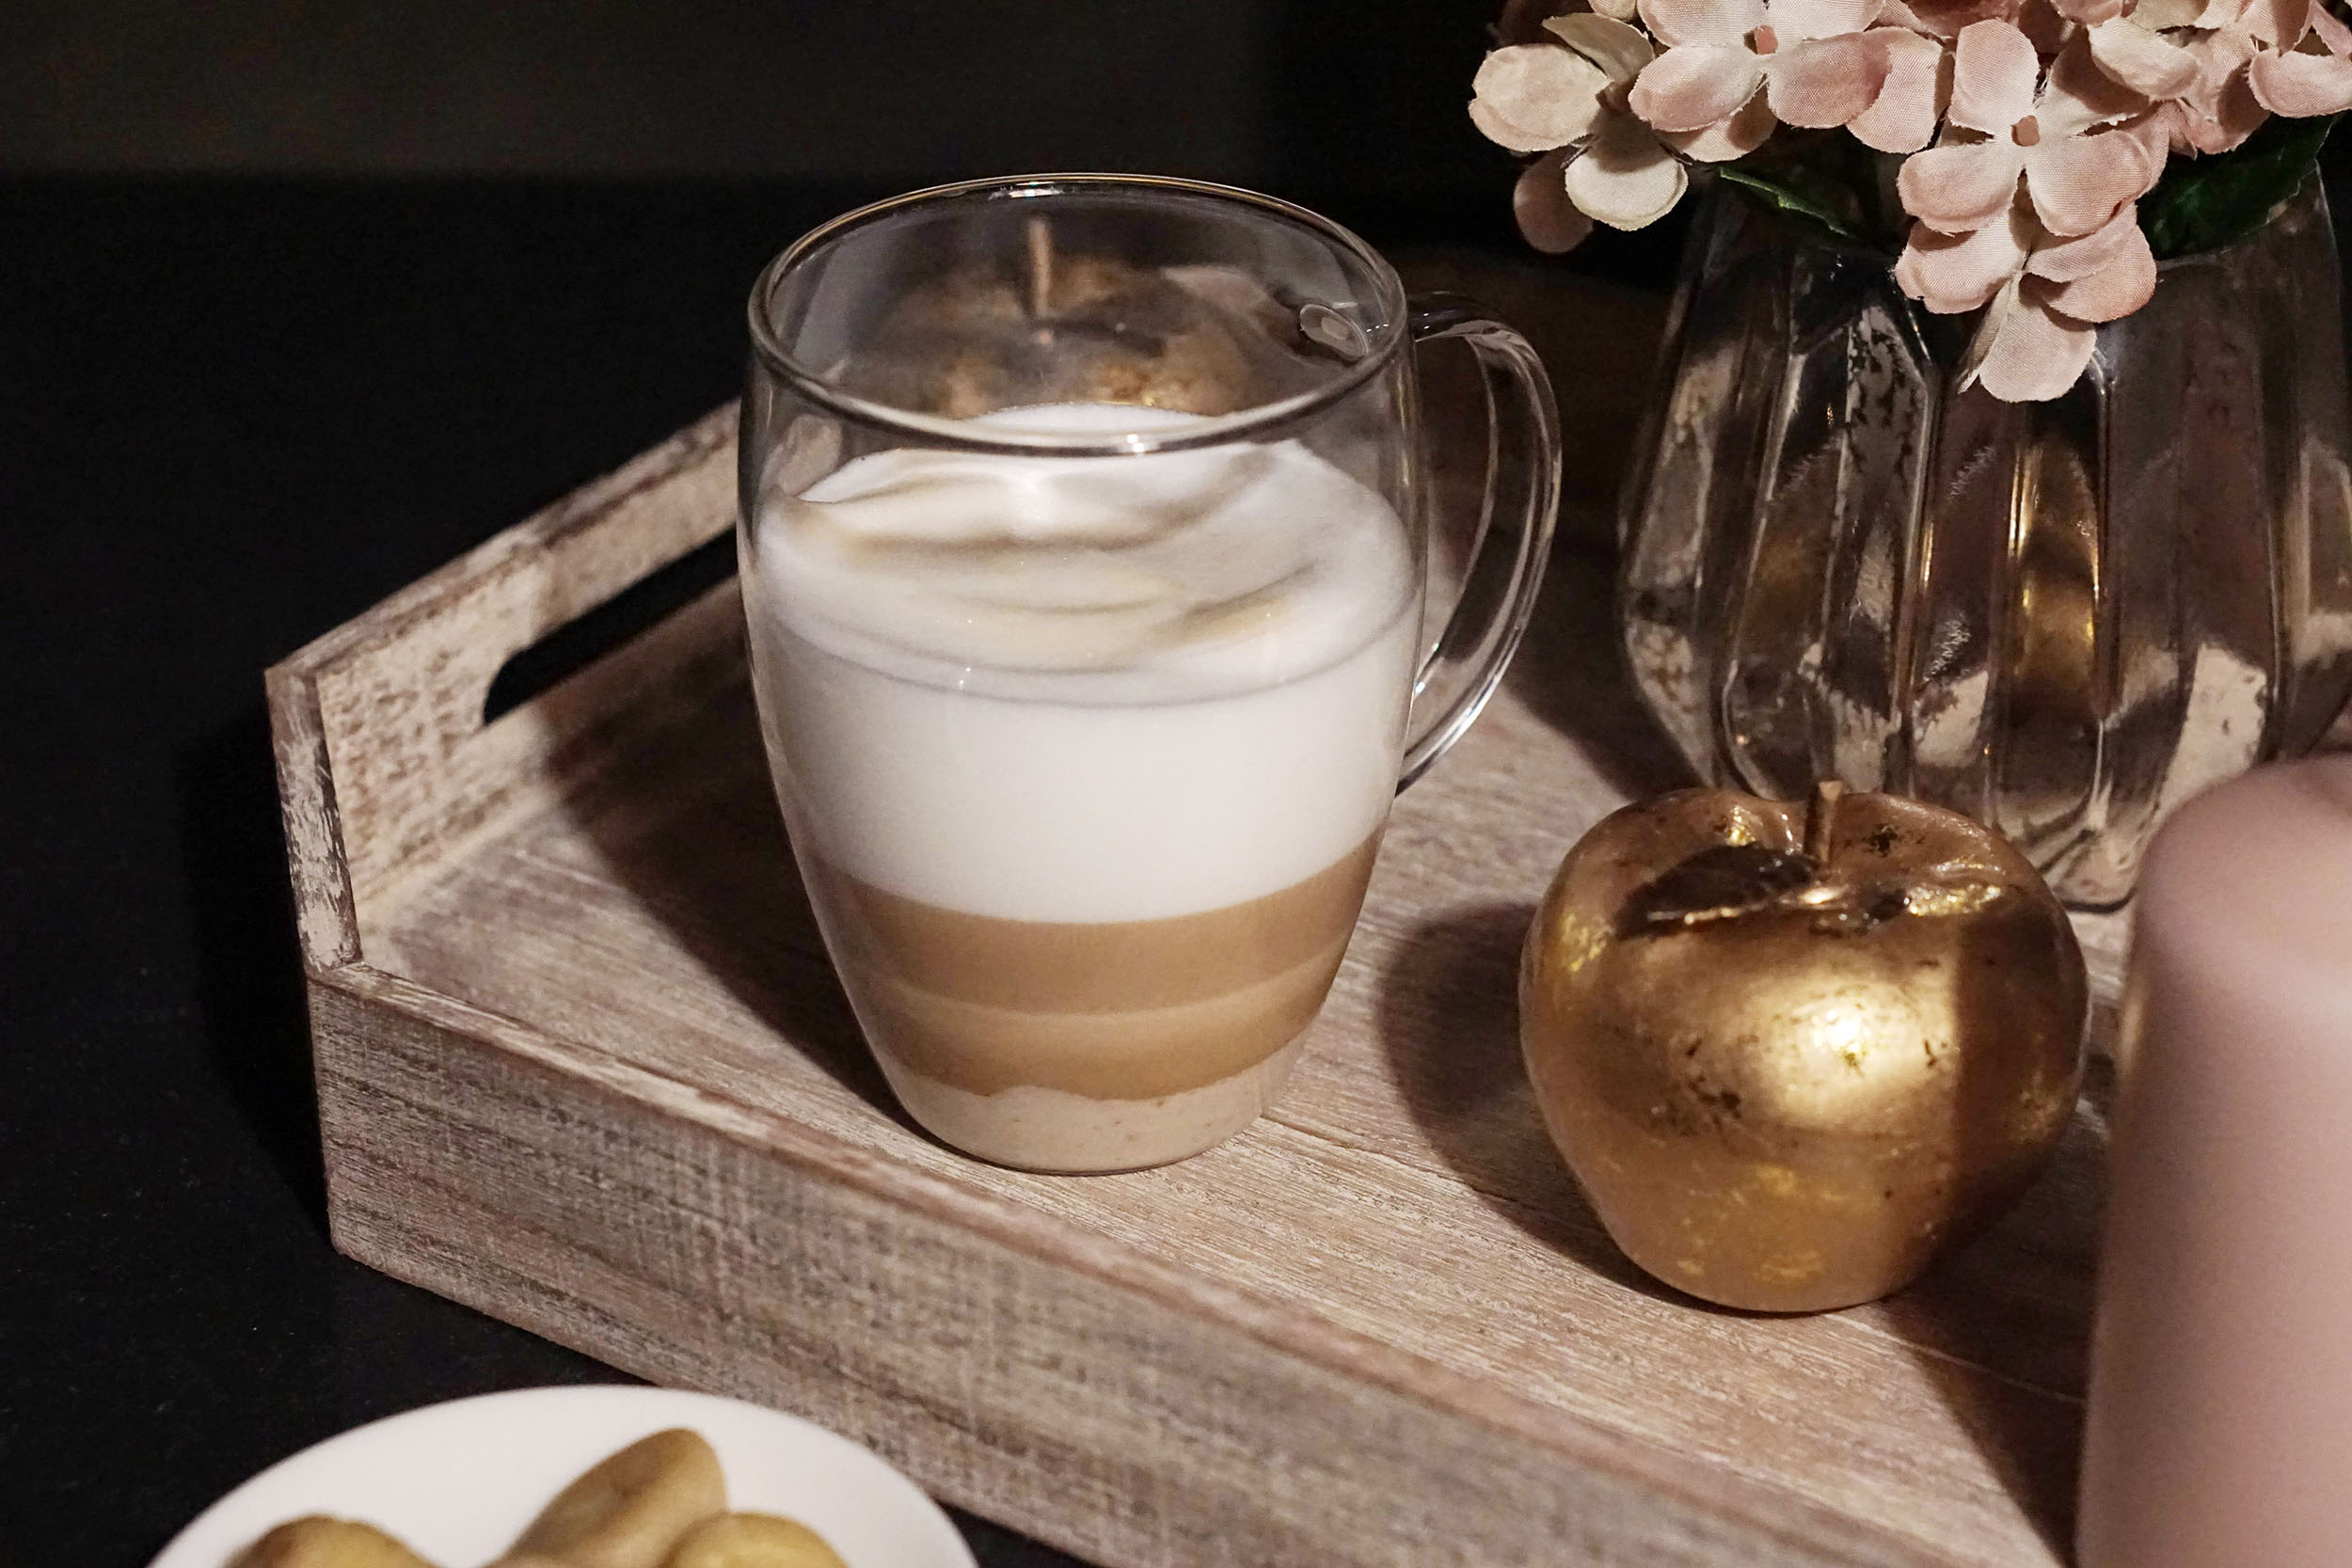 Herbst in der Tasse: So kannst du Chestnut Latte selber machen. Super leckerer Maroni Caffé Latte